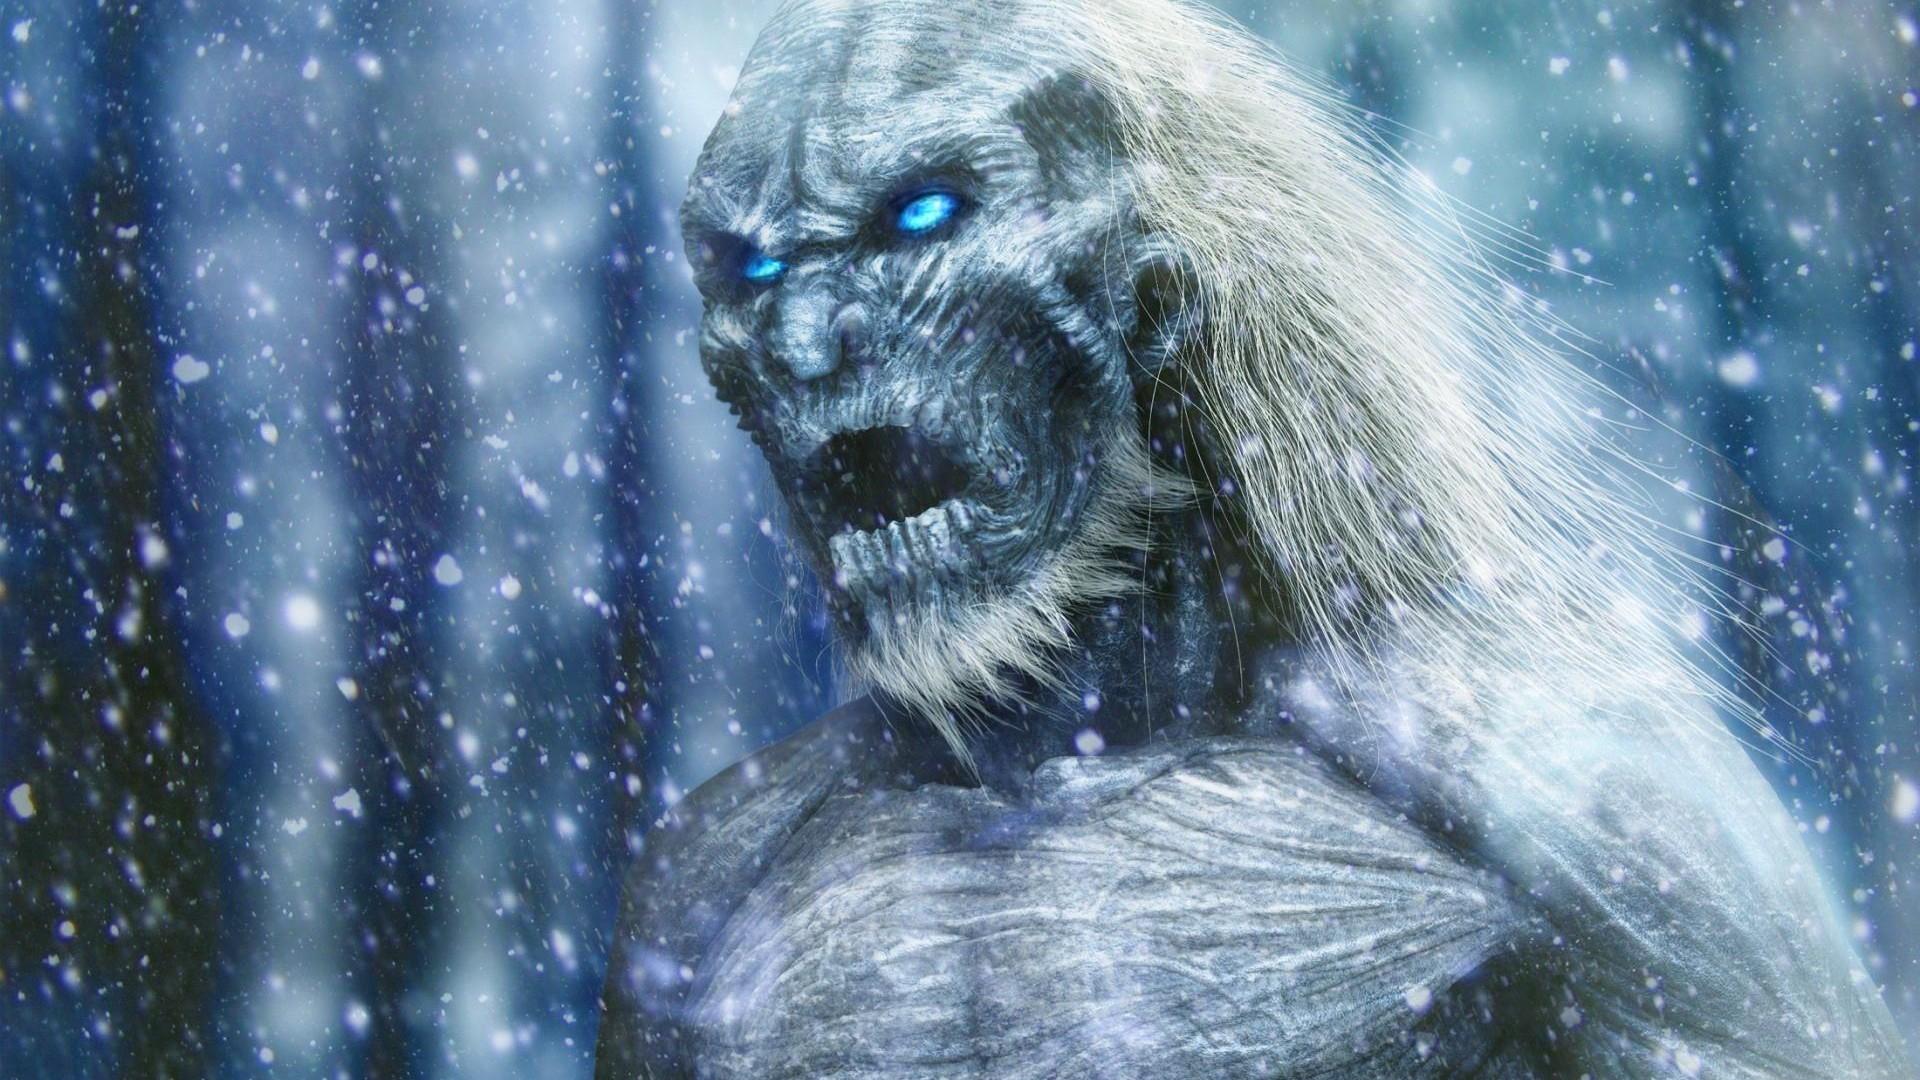 Game of Thrones White Walkers Wallpaper HD Wallpaper …